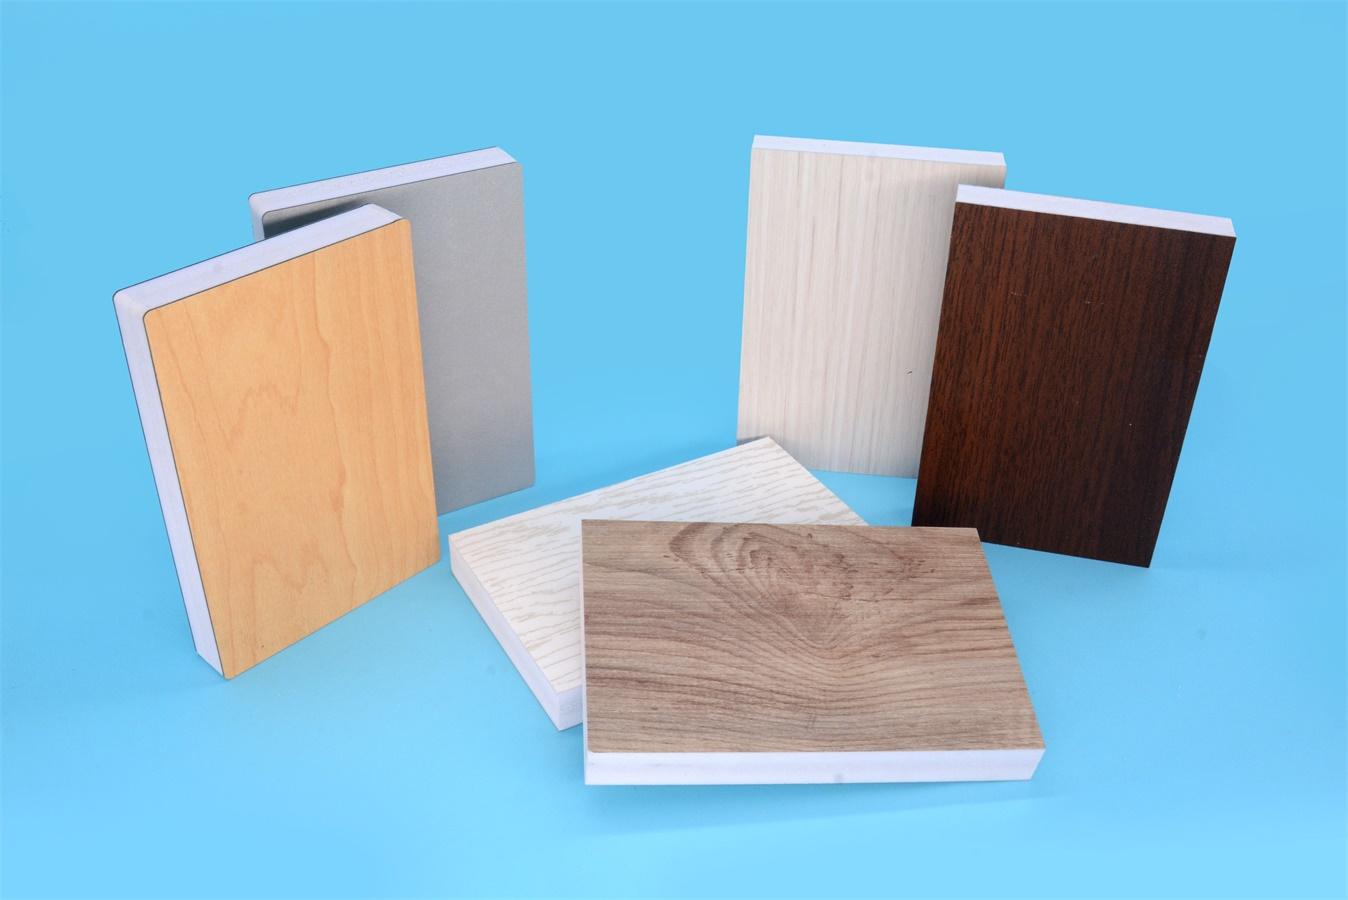 0.5mm  aluminium sheet laiminated board sheet